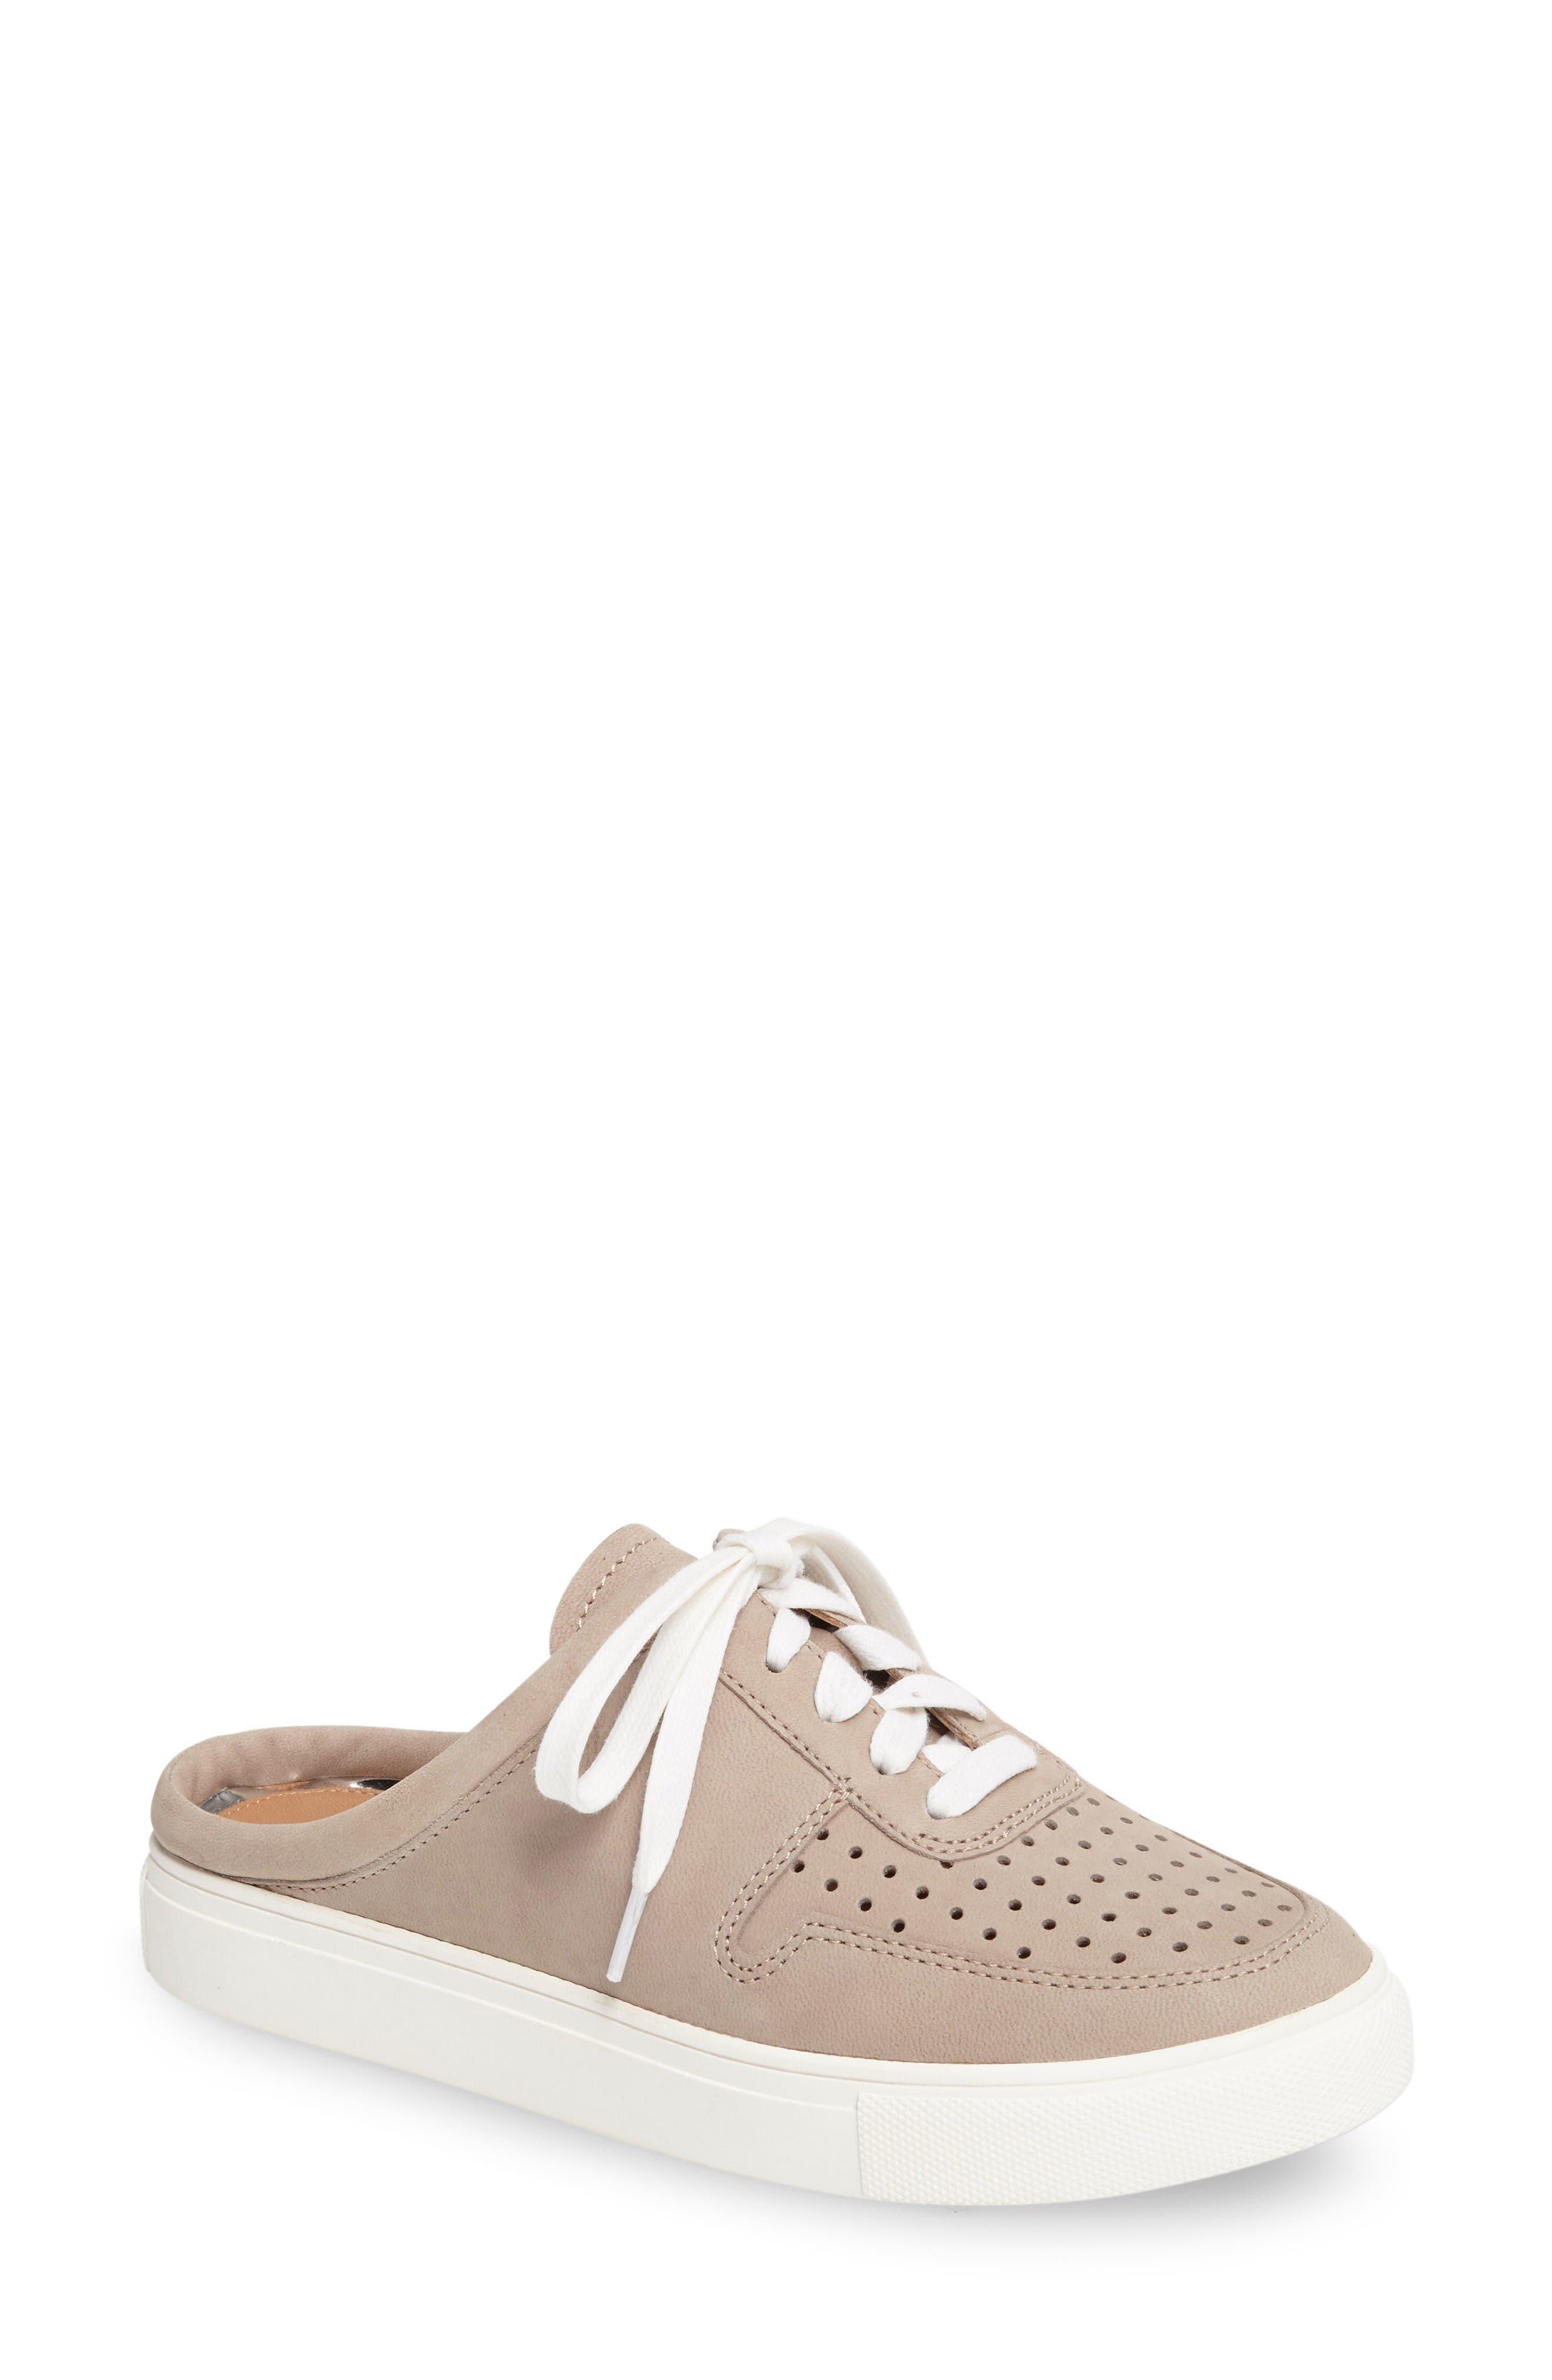 Linea Paolo Kacy Perforated Slide Sneaker (Women)